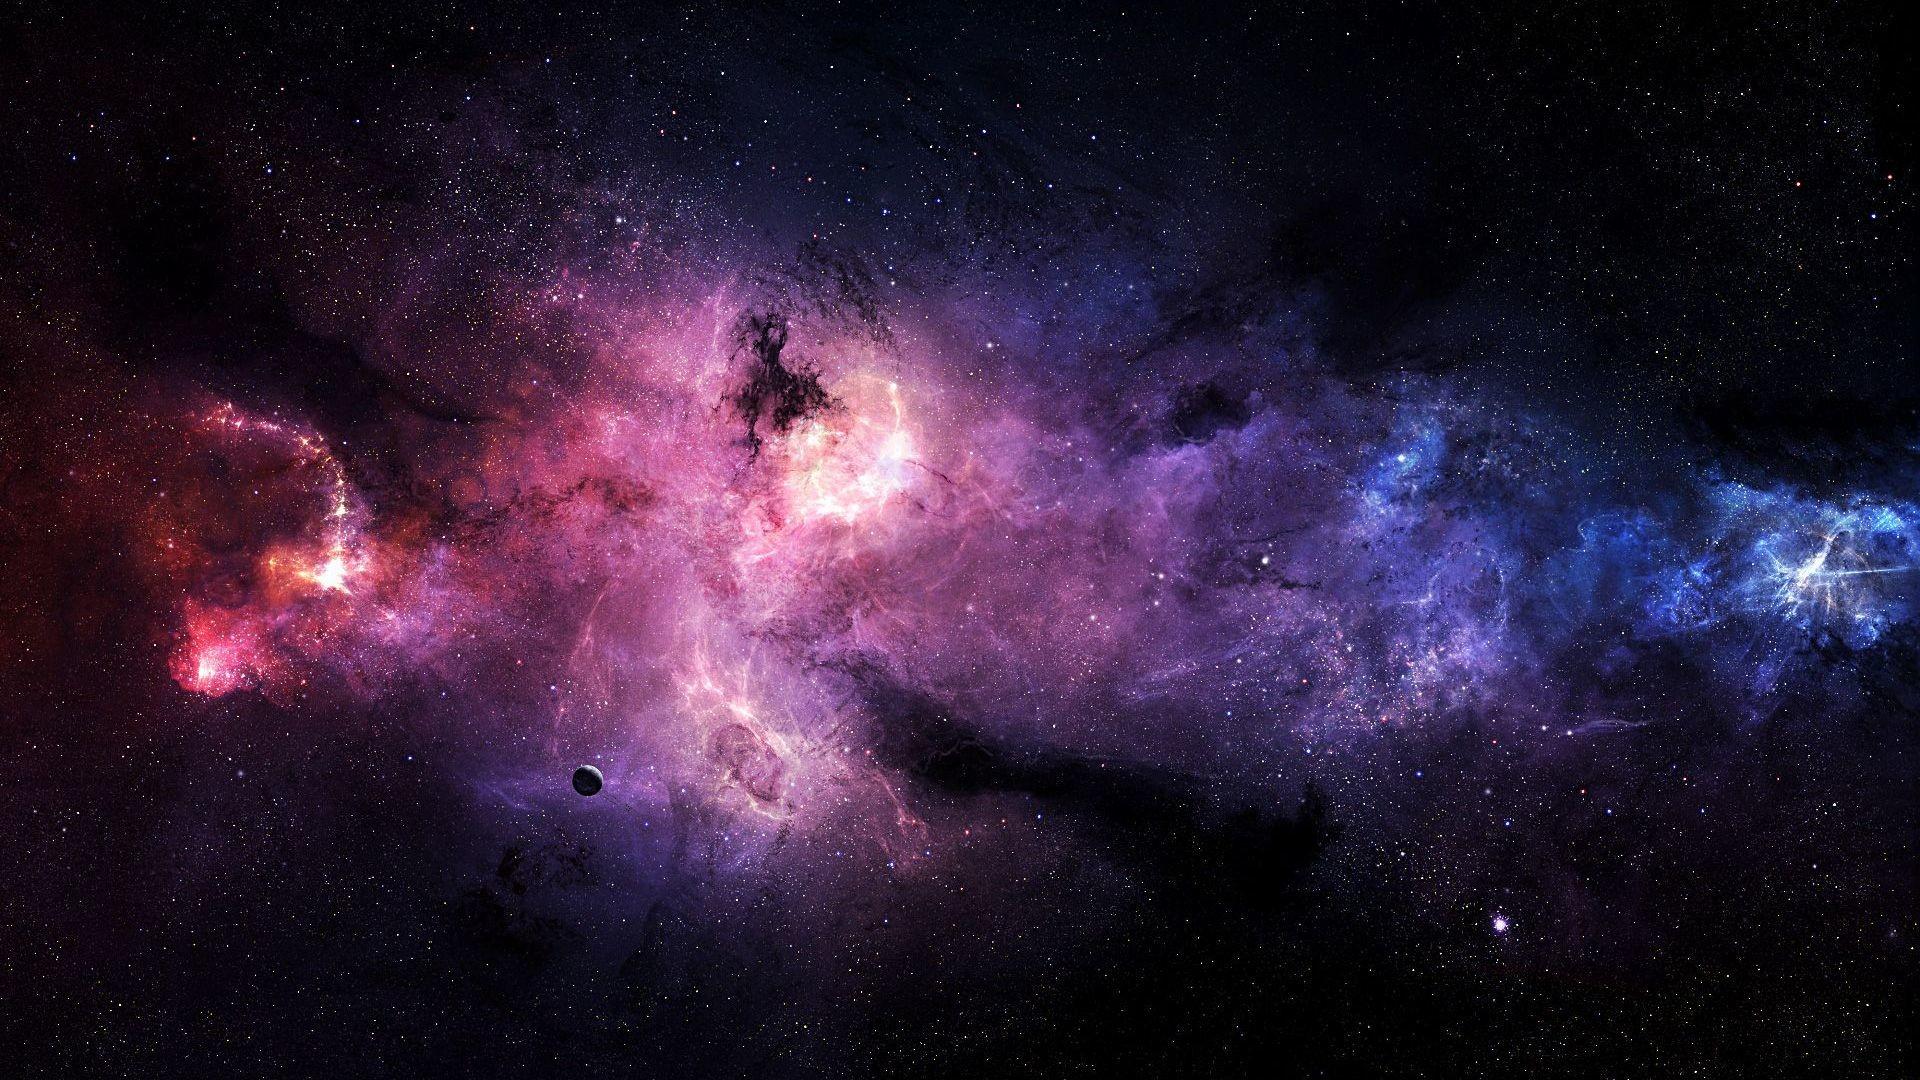 Galaxy Wallpaper 1920x1080 80 Images